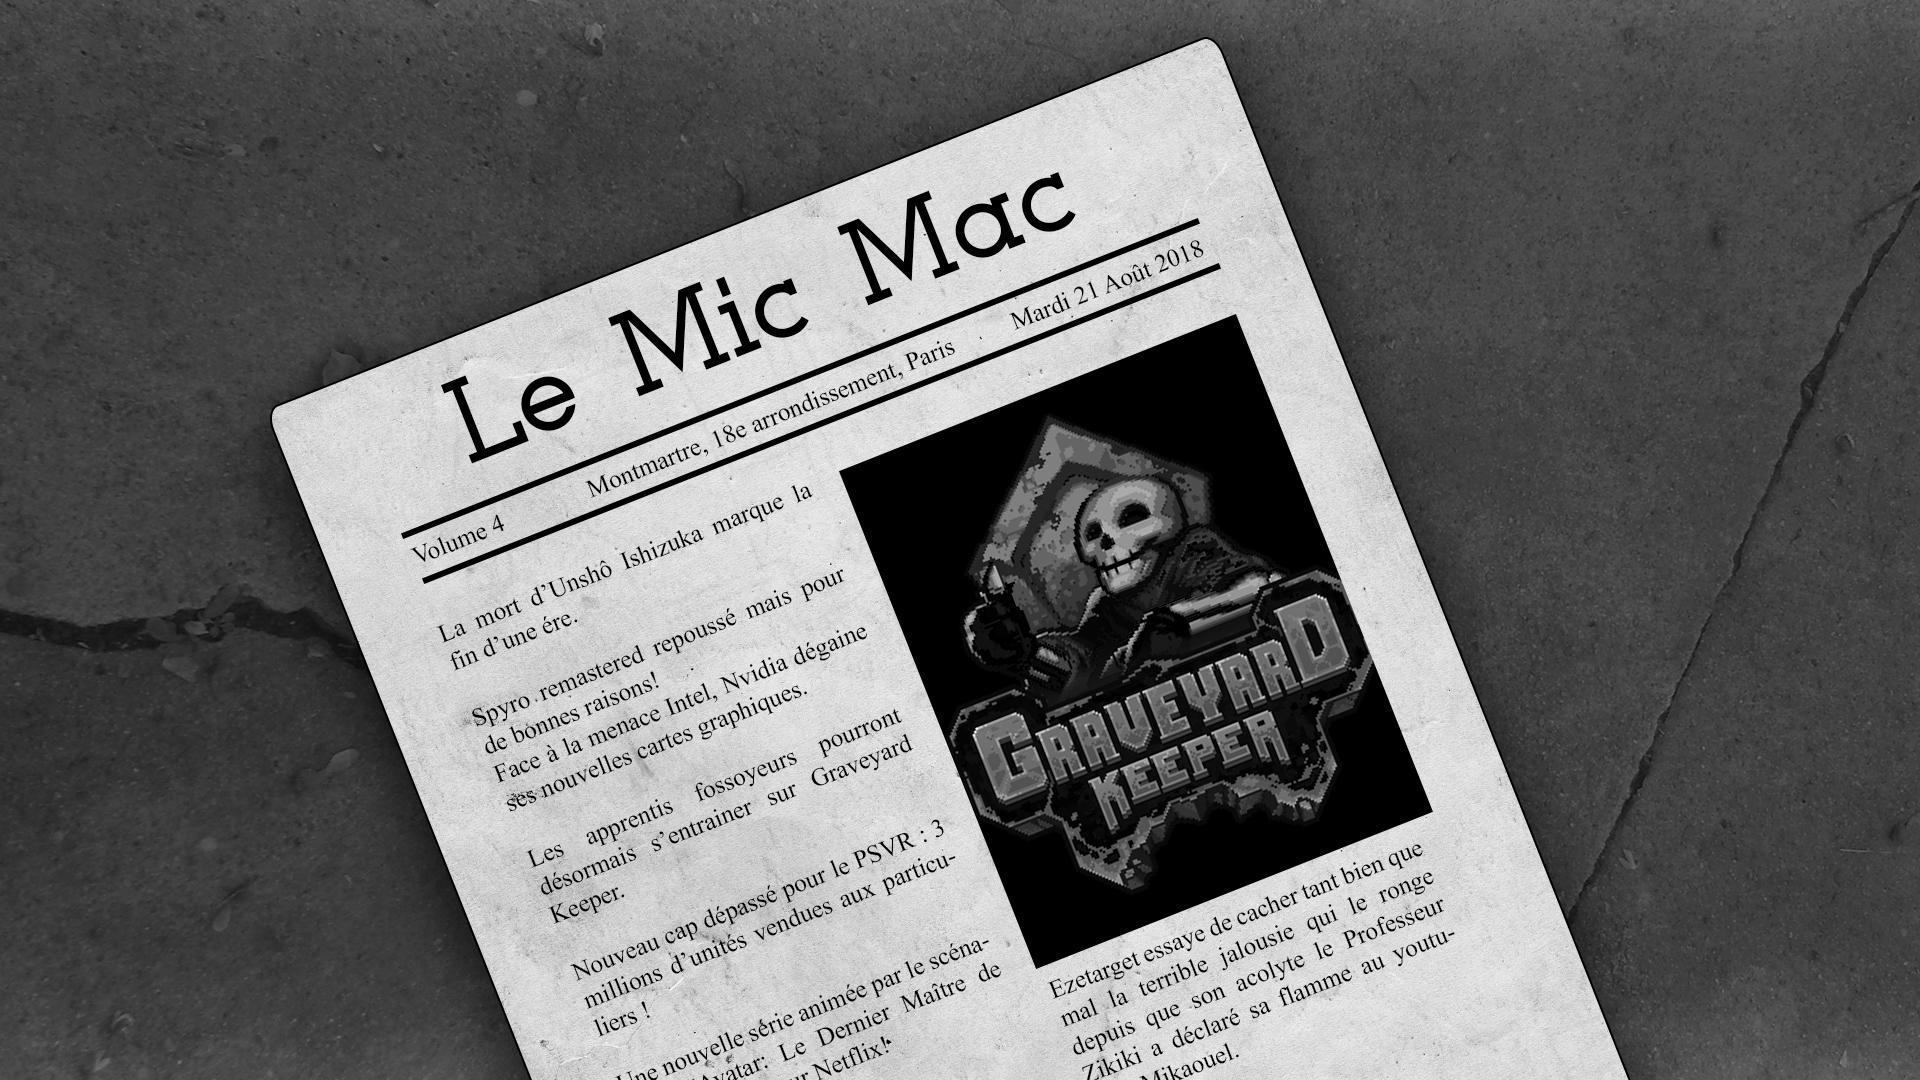 Podcast Au Tour du Mic – Mic Mac #4 : 14/08/2018 au 20/08/2018